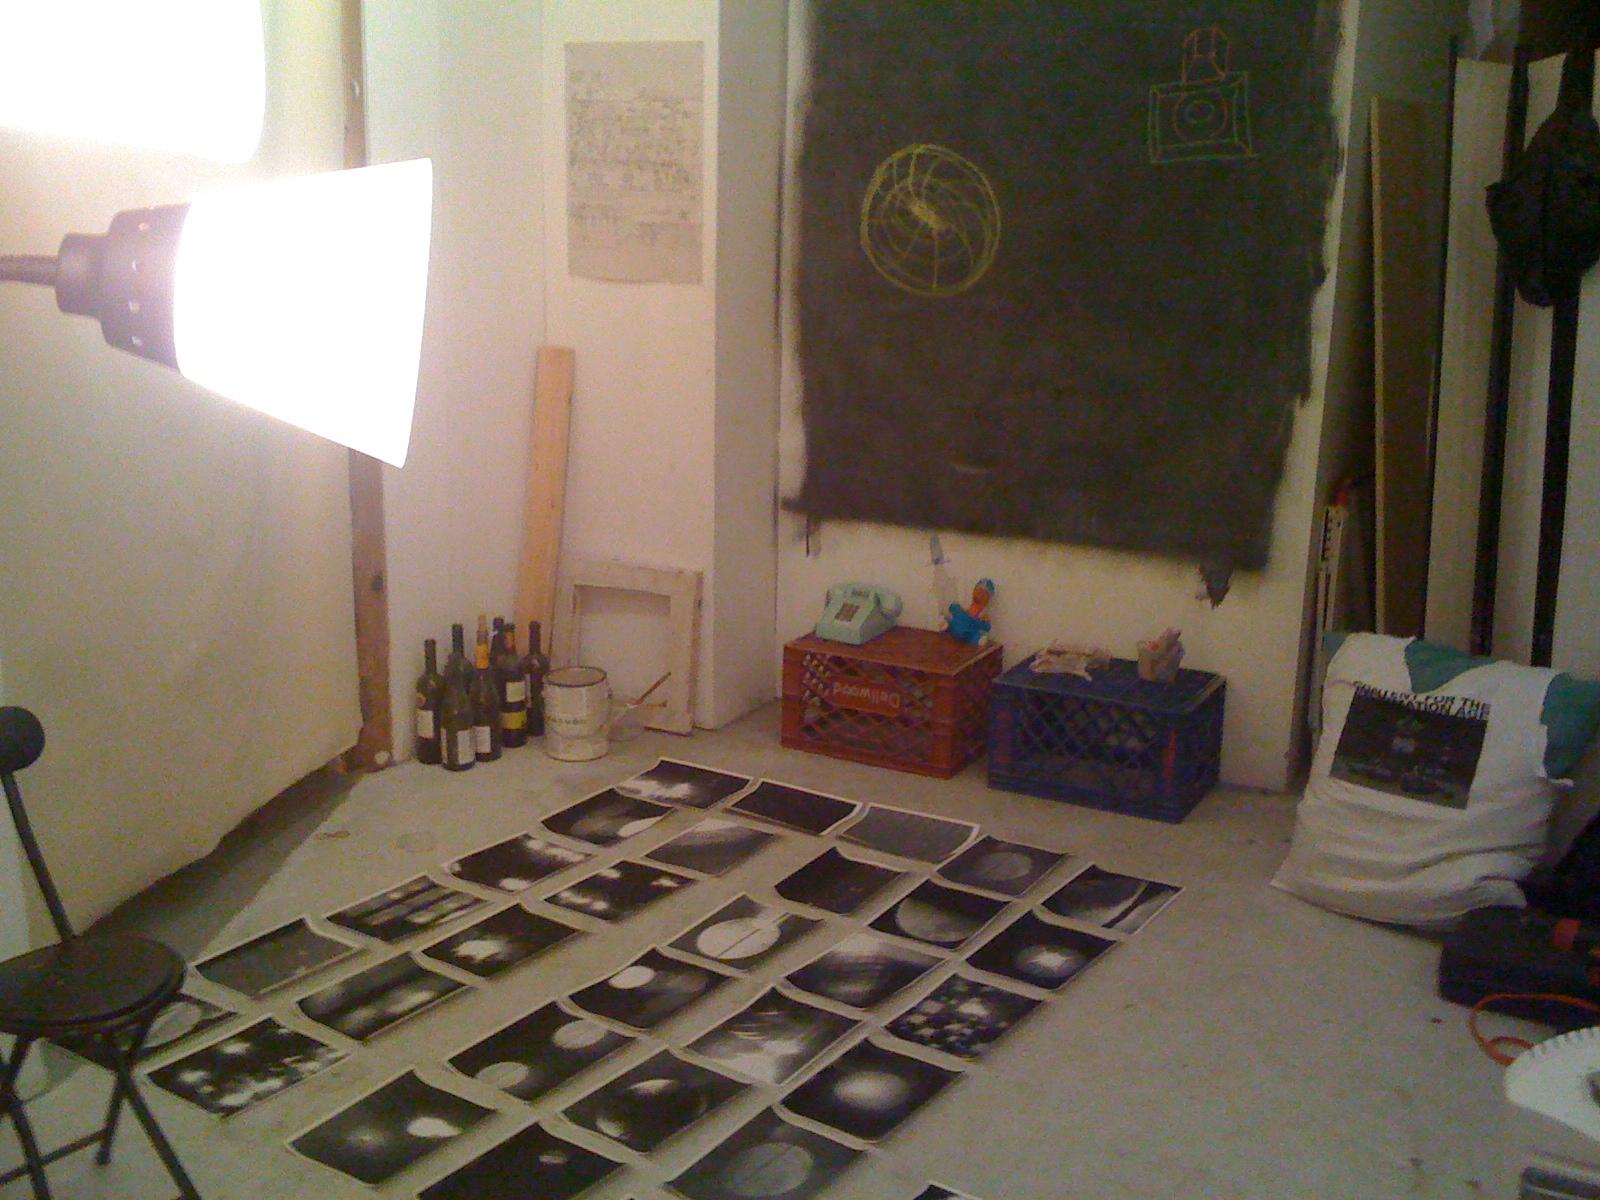 Studio times, Greenpoint, Brooklyn, March 13, 2010